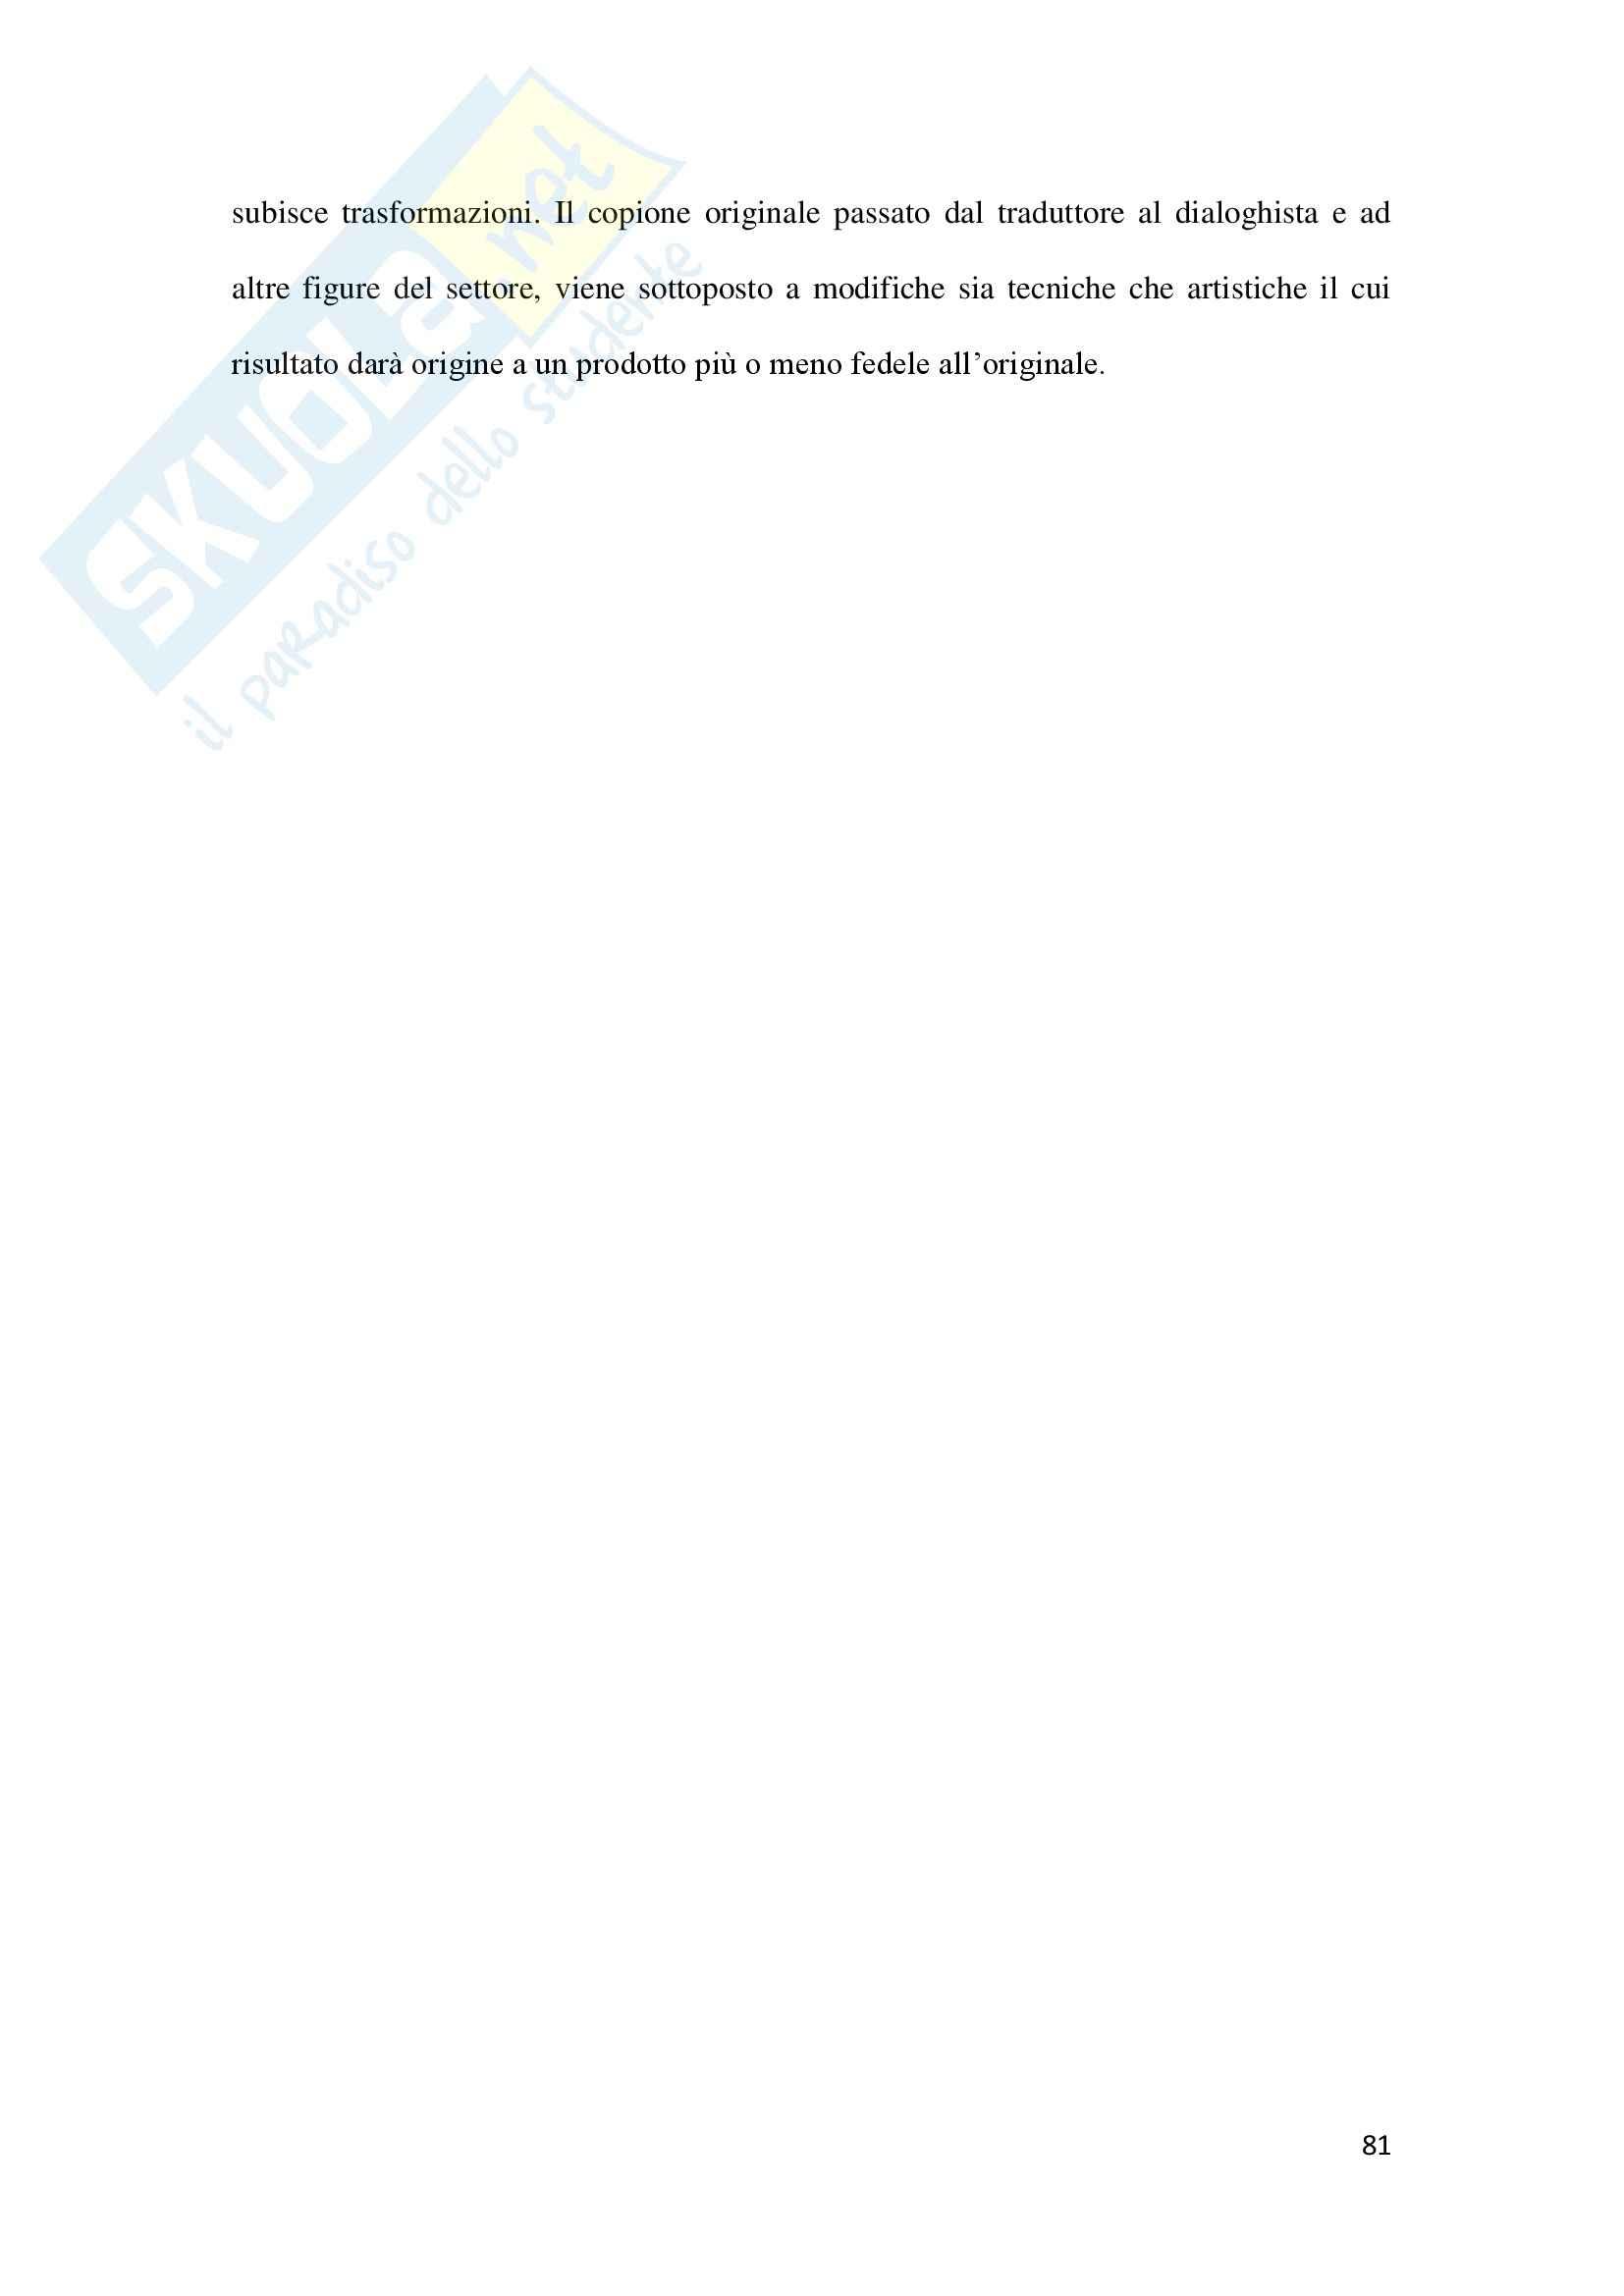 Linguaggio di Internet, Lingua inglese Pag. 81